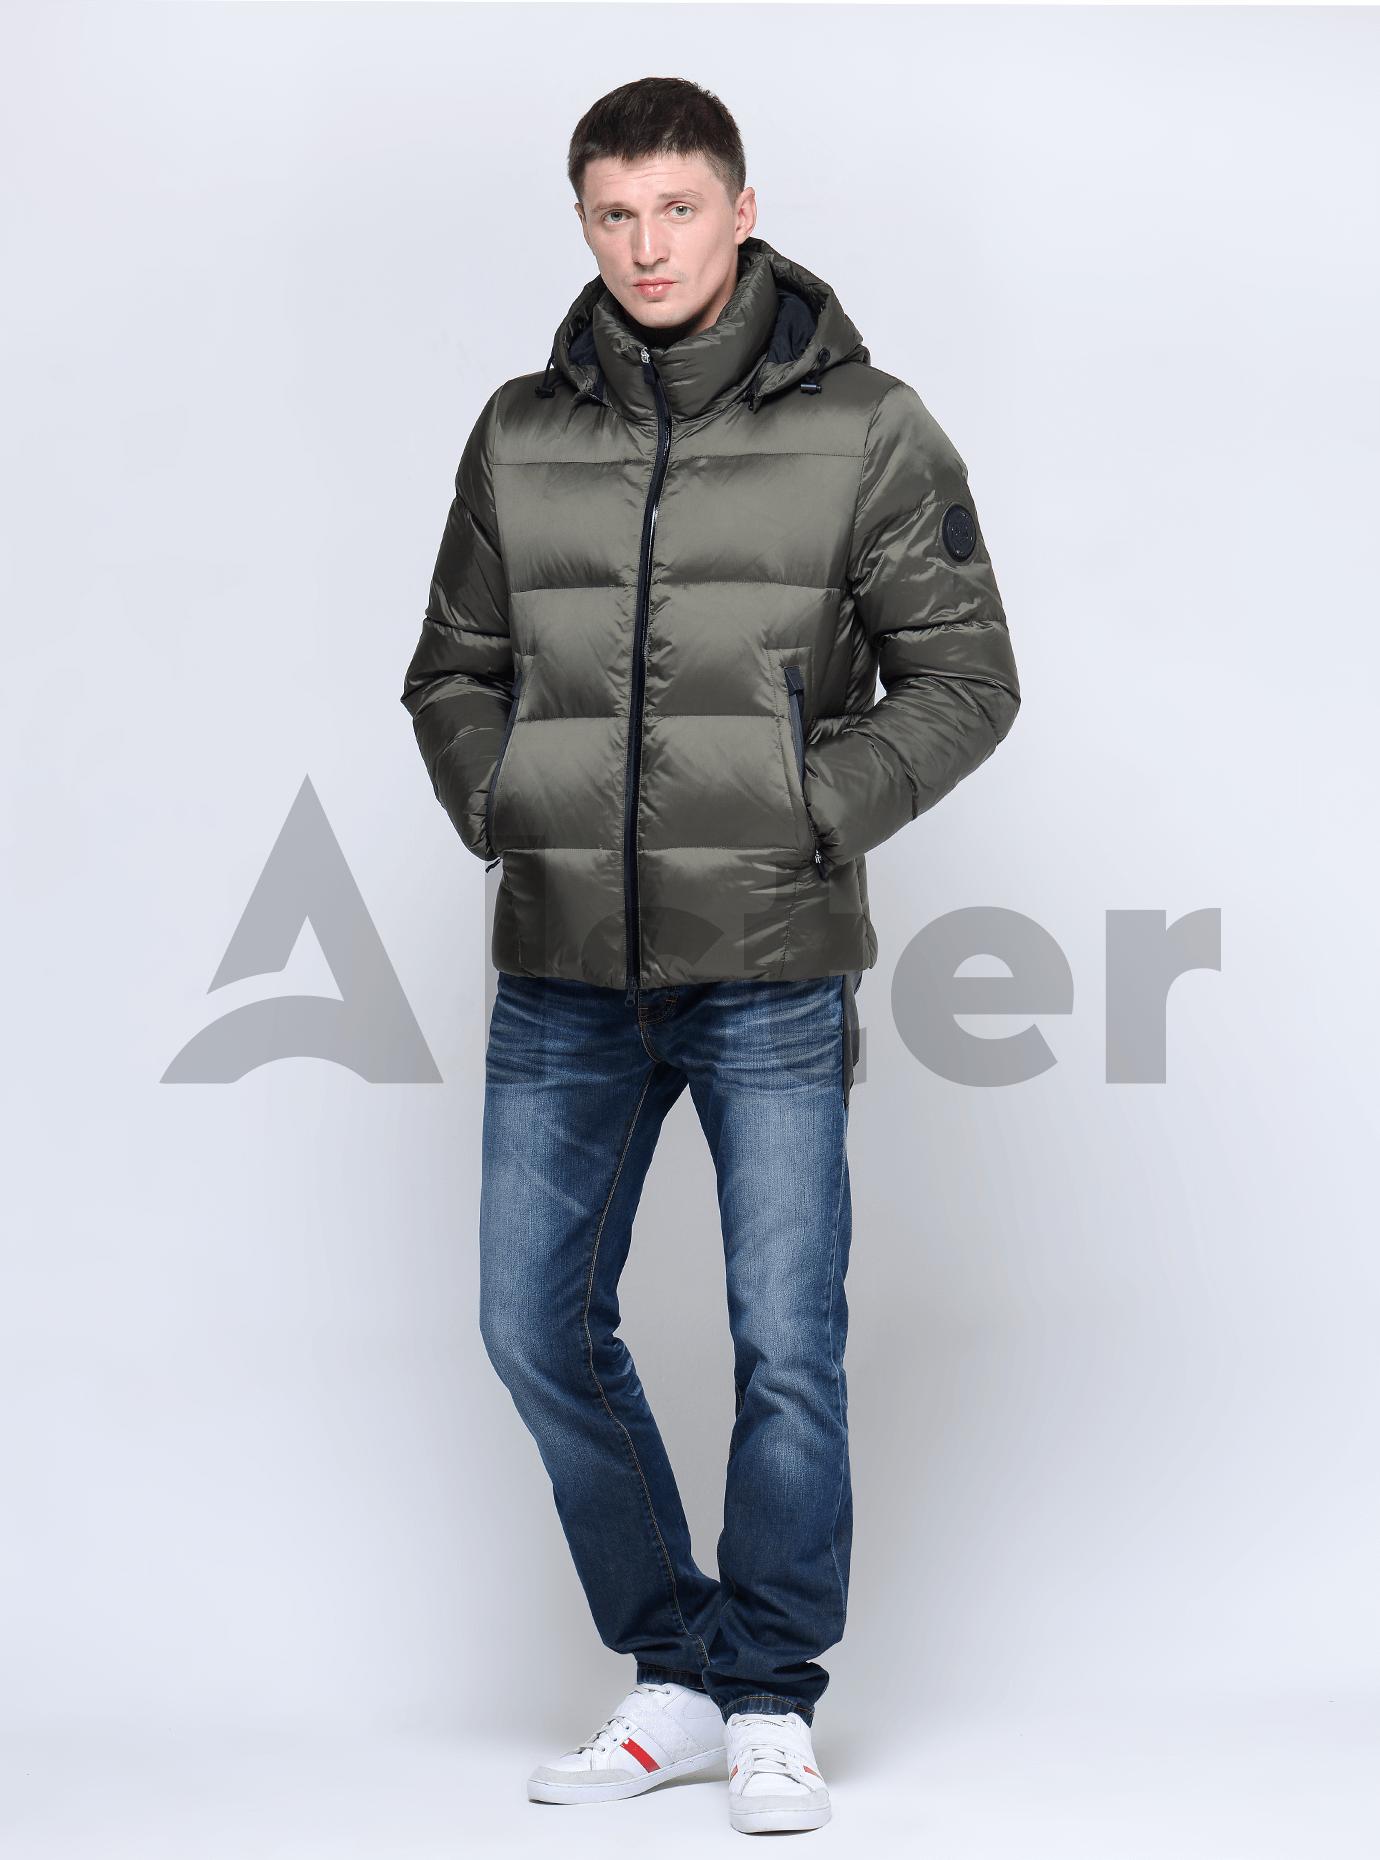 Куртка мужская зимняя Серый 46 (02-MC19052): фото - Alster.ua